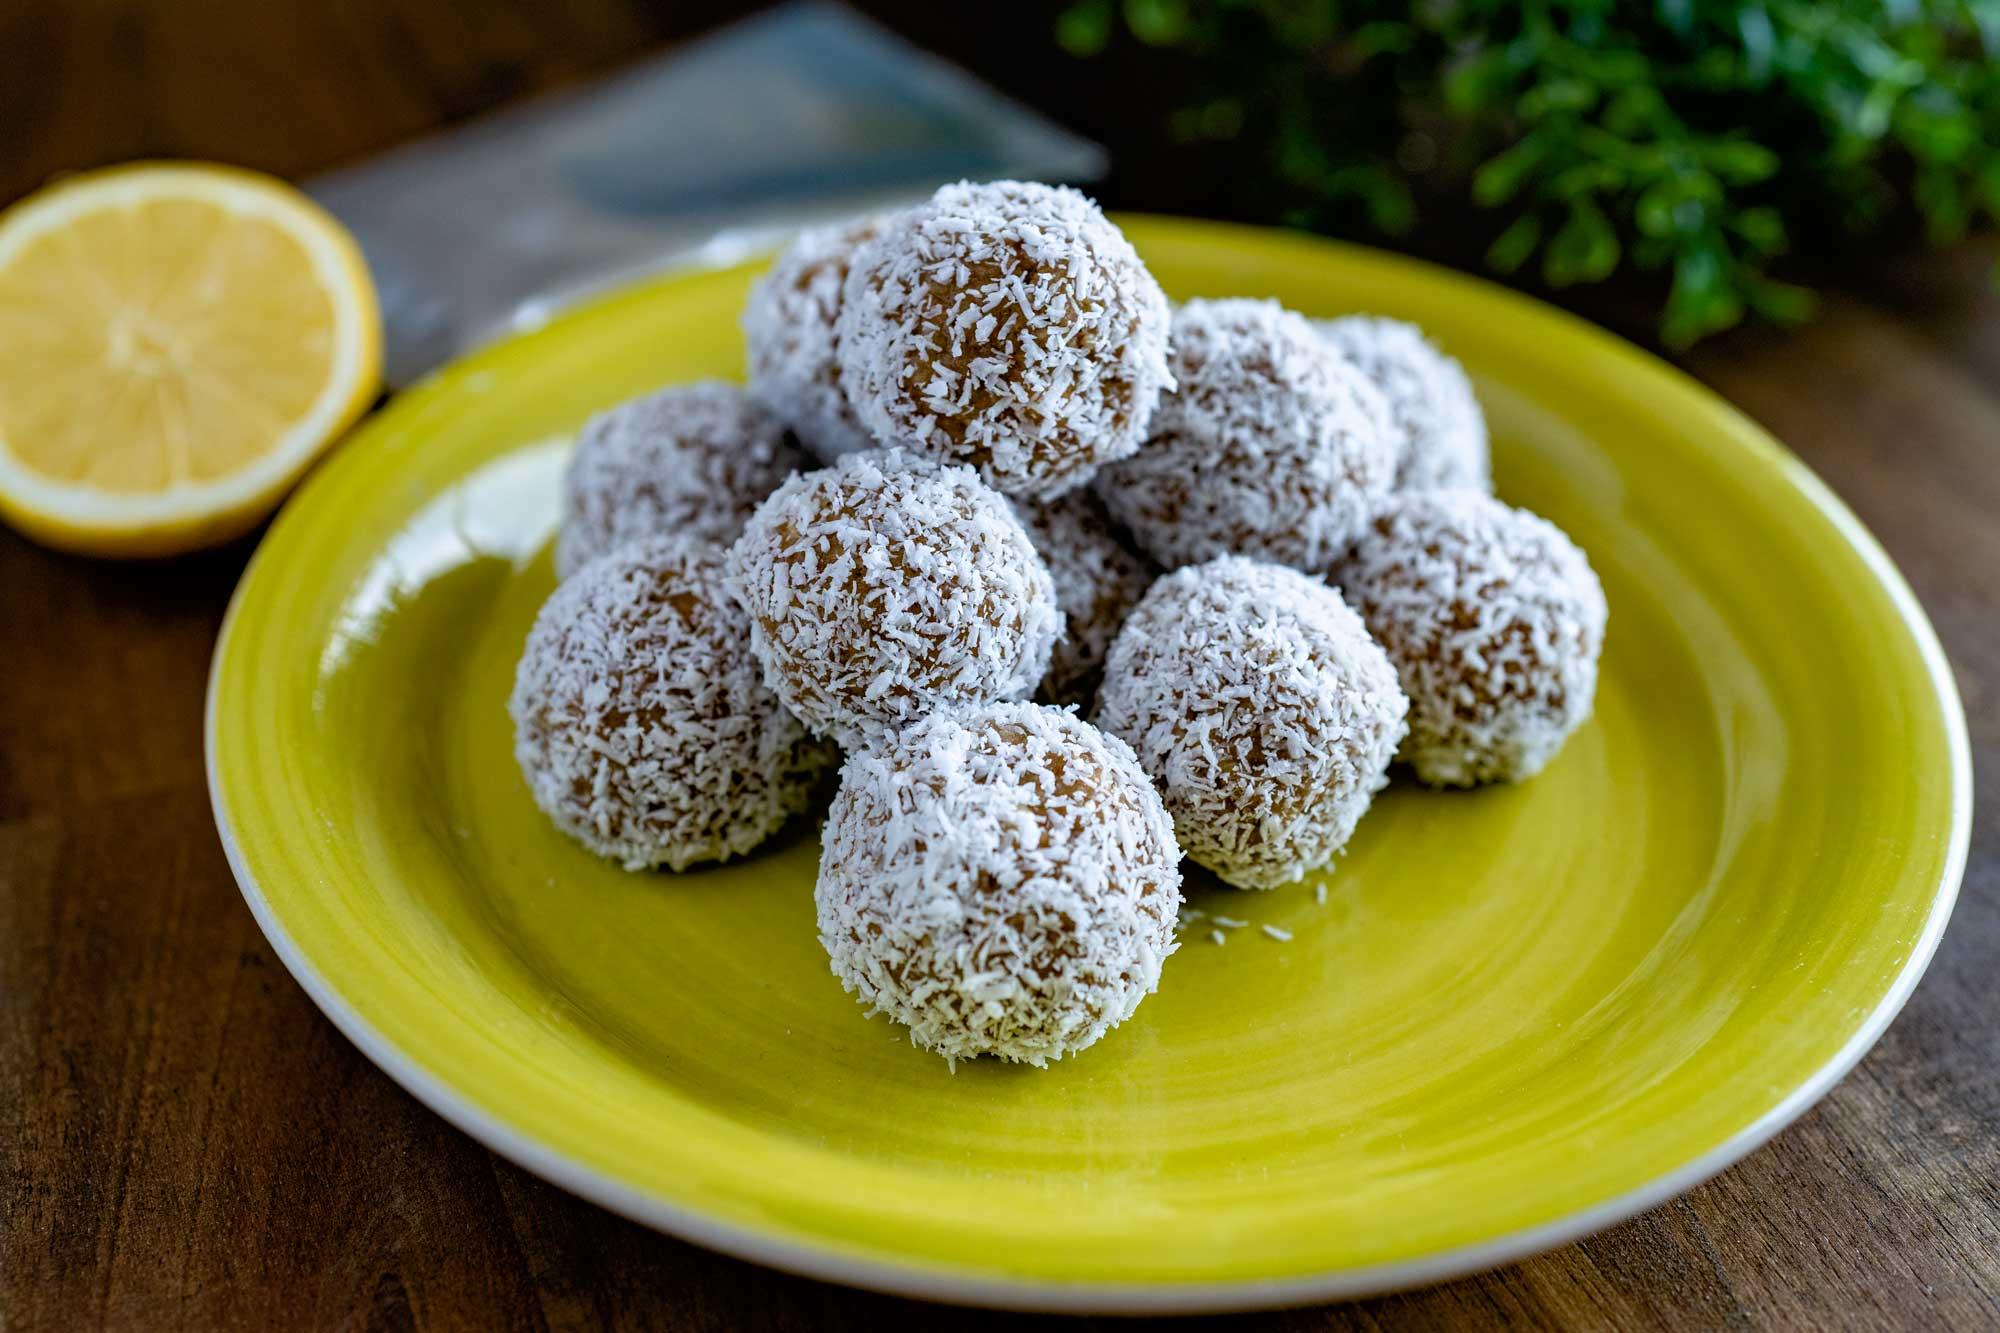 Beljakovinske kroglice z limono in kokosom